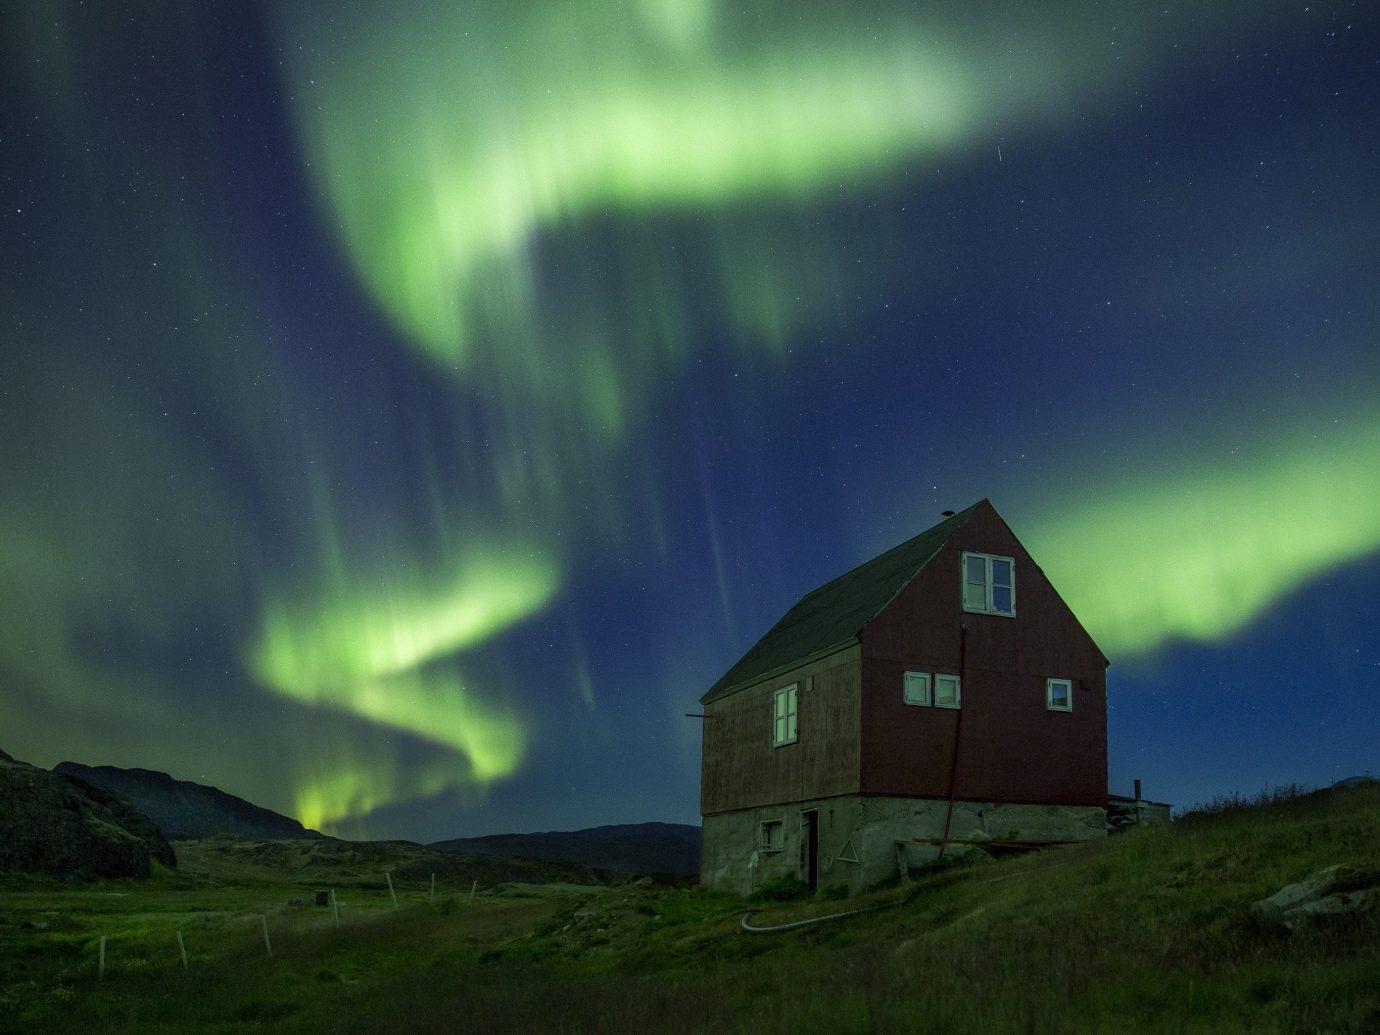 Trip Ideas grass outdoor aurora light atmosphere night house